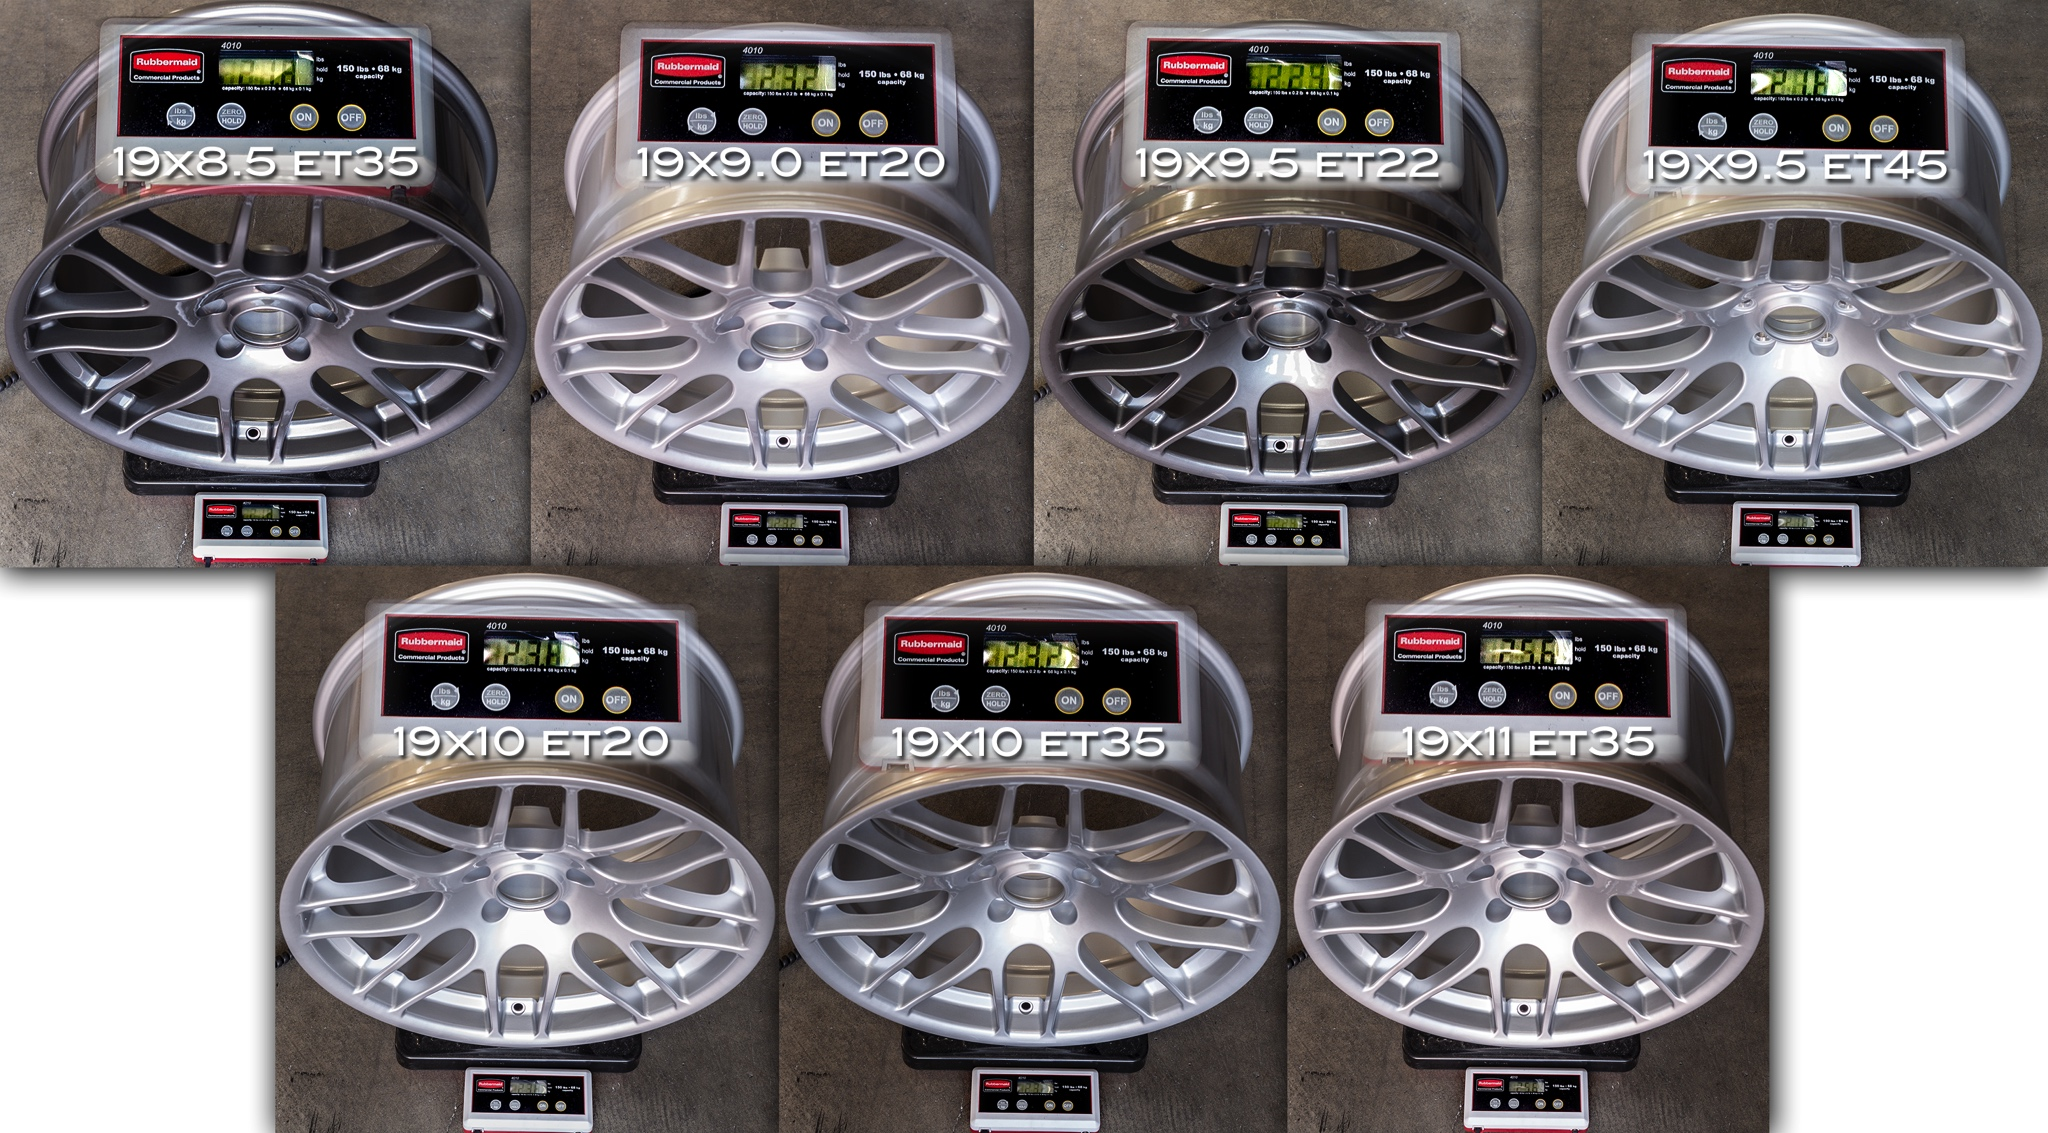 Sportline SL8 BMW M3 CSL Replica Wheel Weights Forged